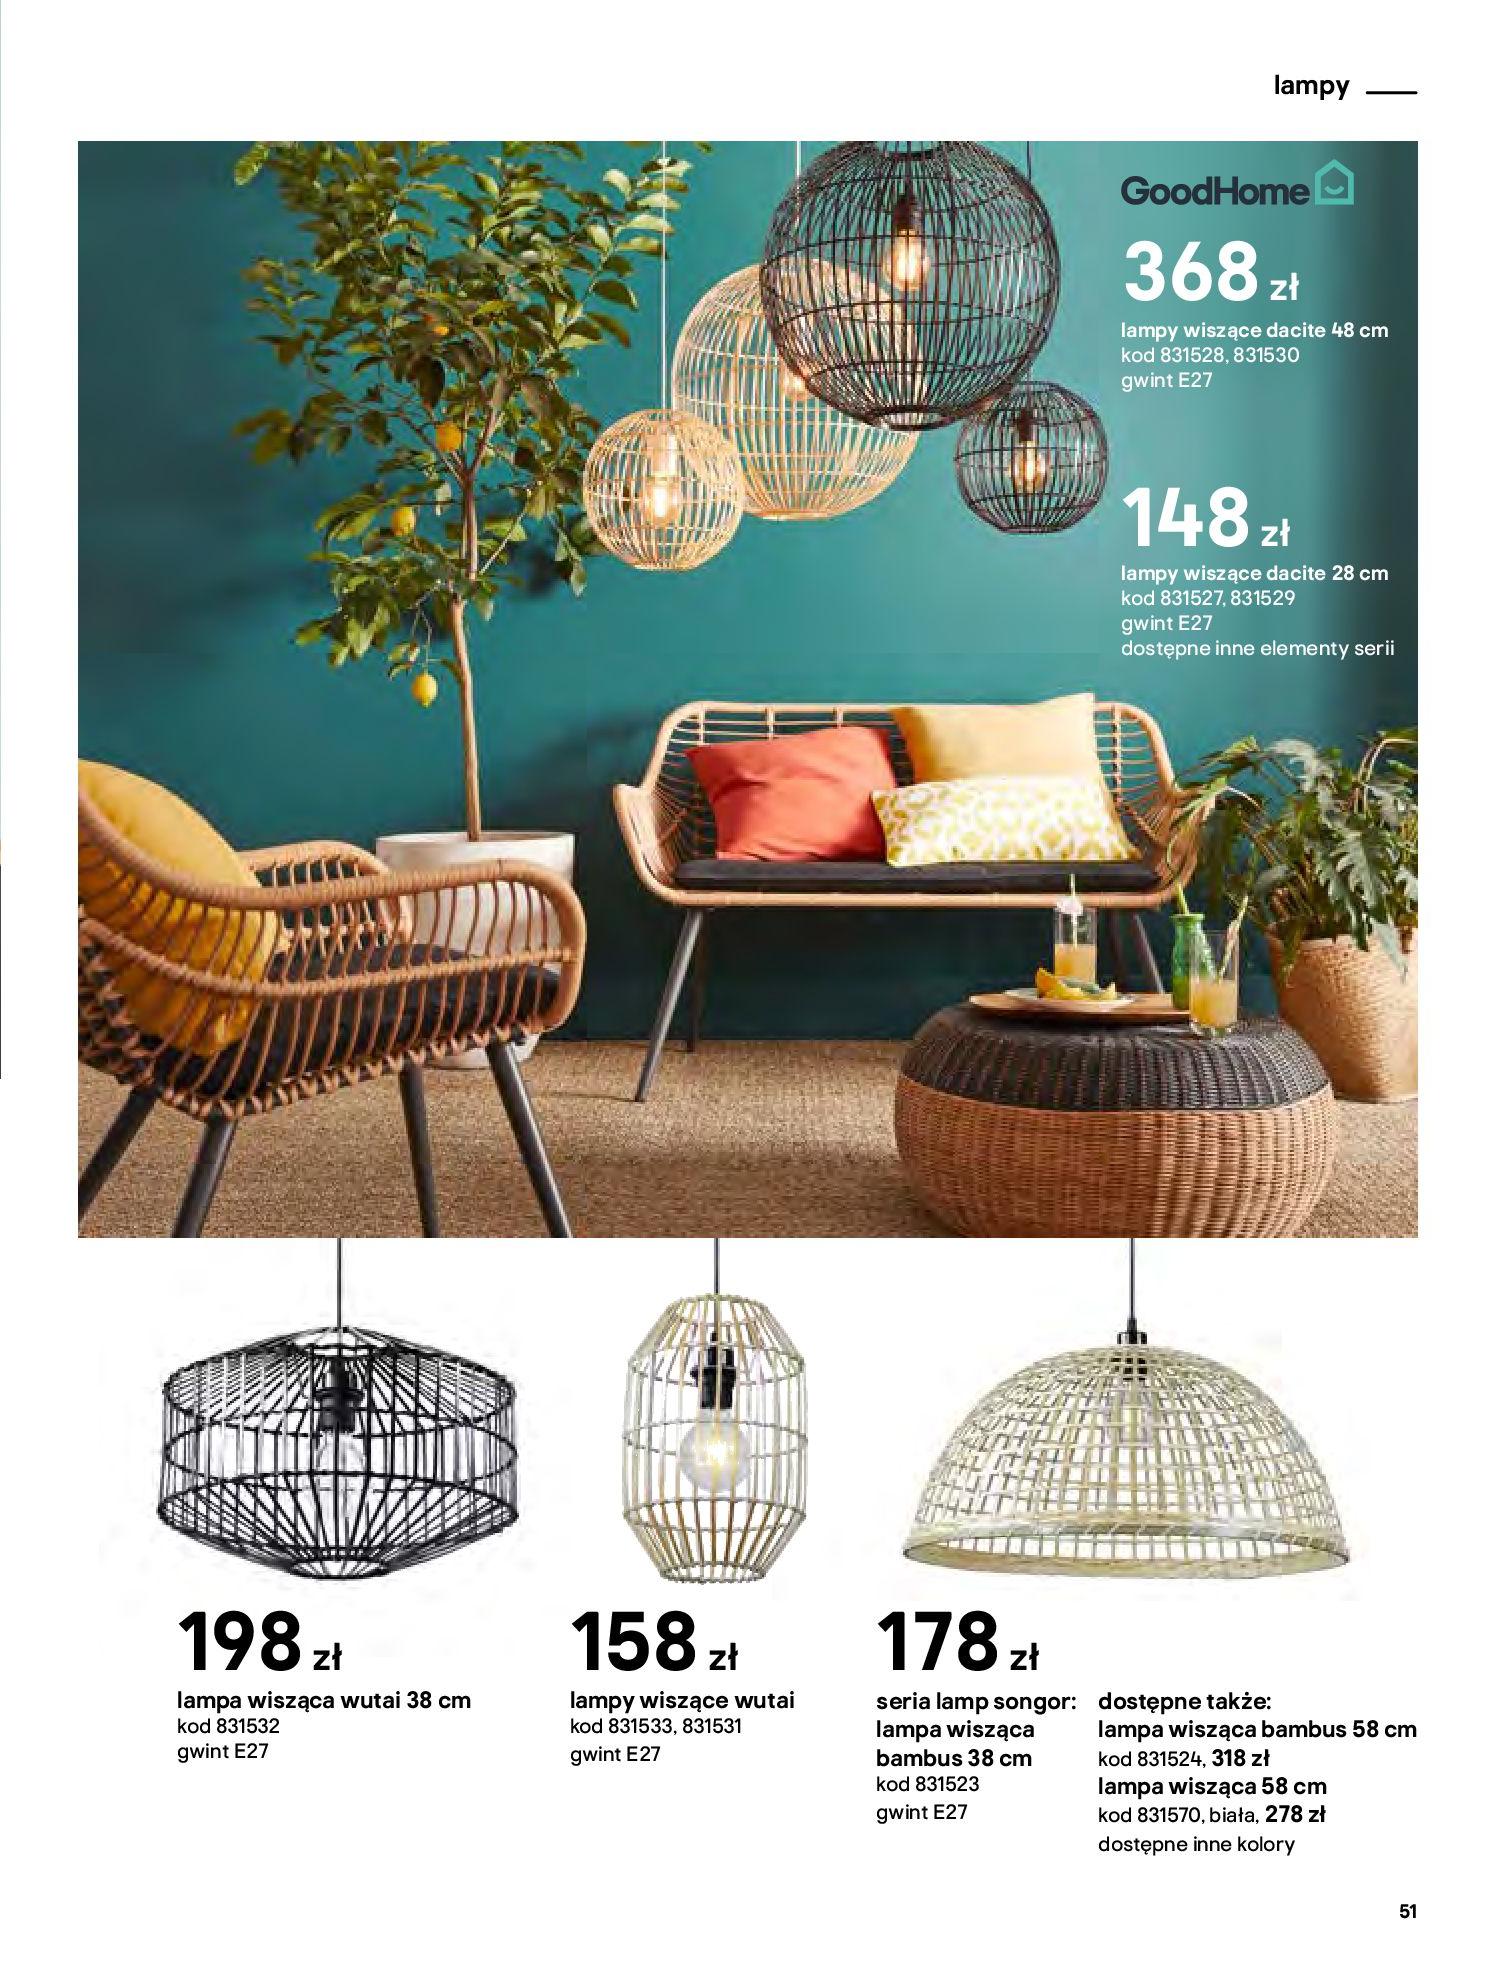 Gazetka Castorama - Katalog Dekoracje-22.10.2020-31.12.2020-page-51